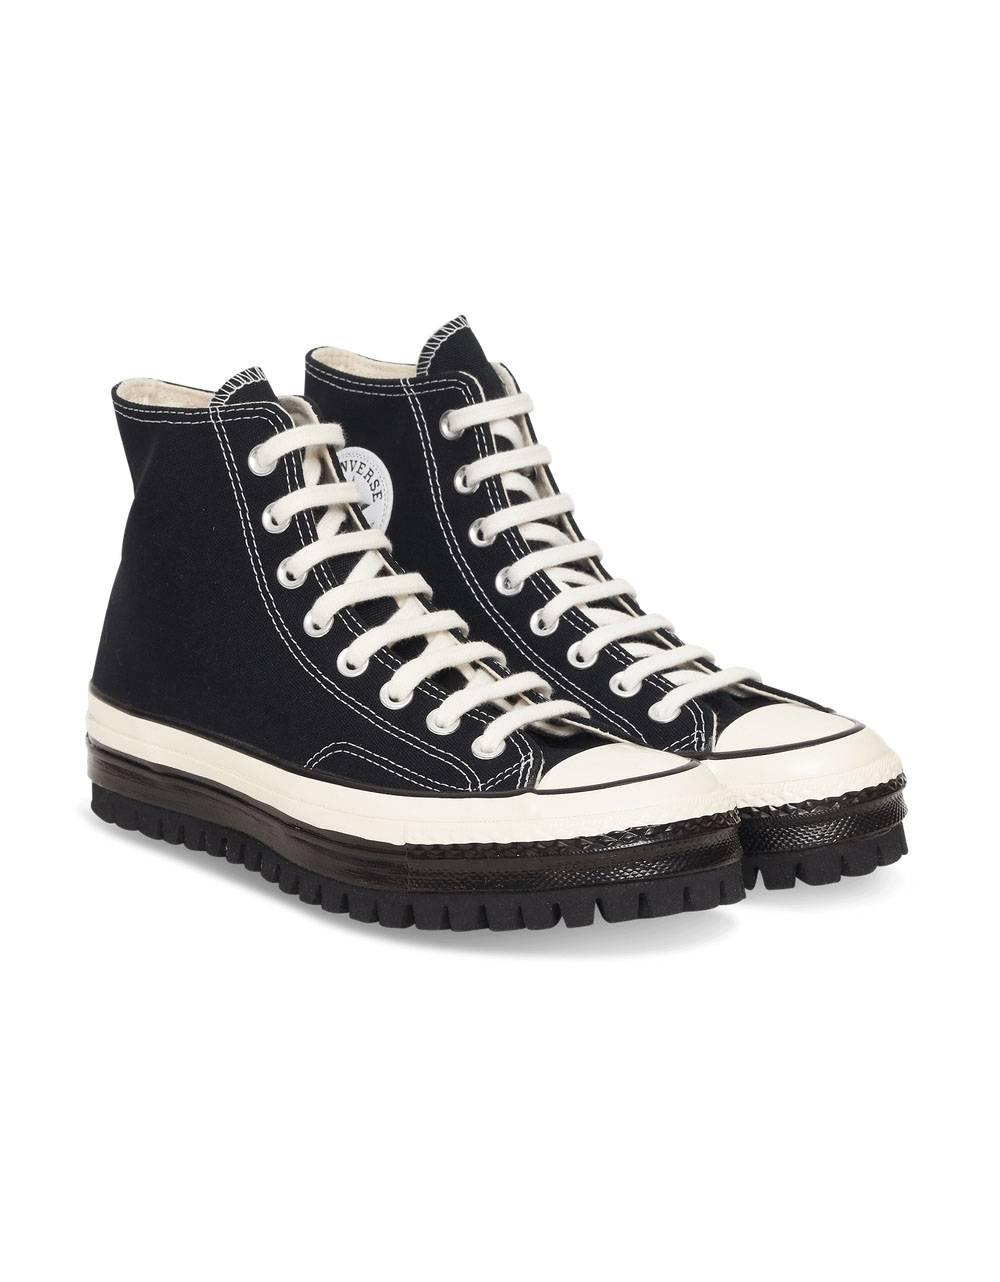 Converse Woman's Chuck 70 Hi Canvas Trek Ltd Sneakers - black Converse Sneakers 152,46€